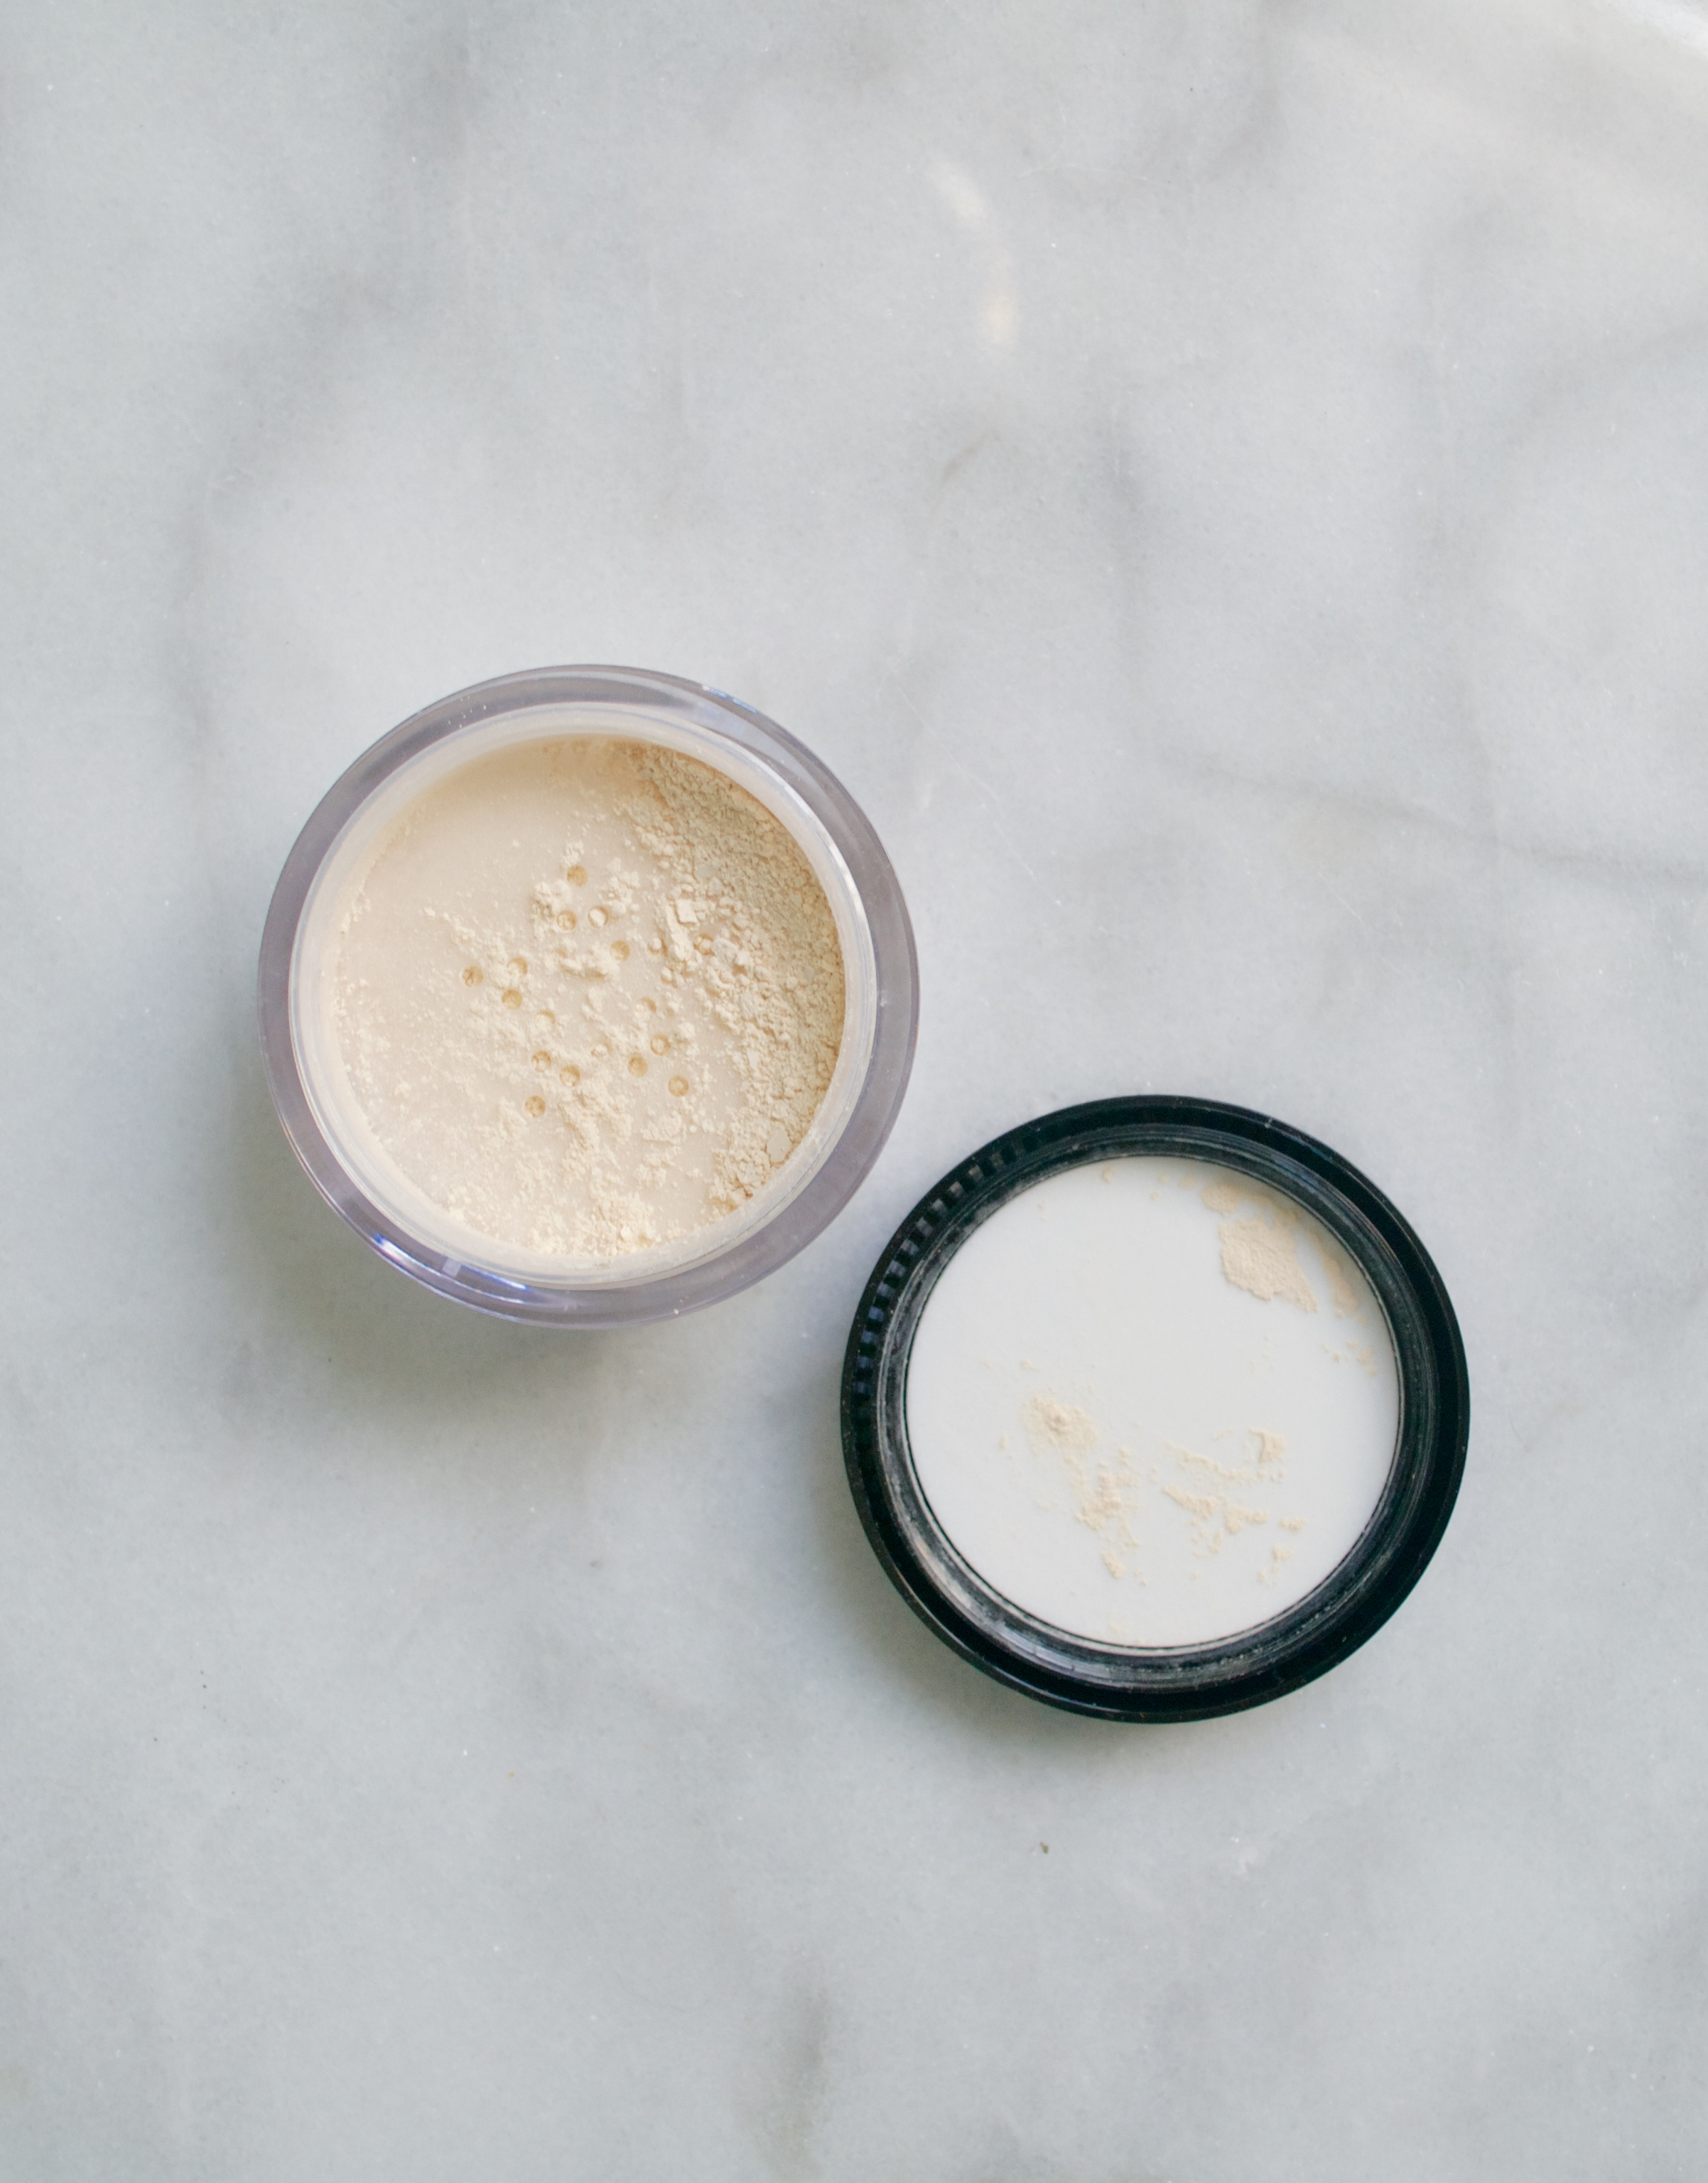 Kat Von D Lock-it Setting Powder, Baking Foundation, Best Loose Powder